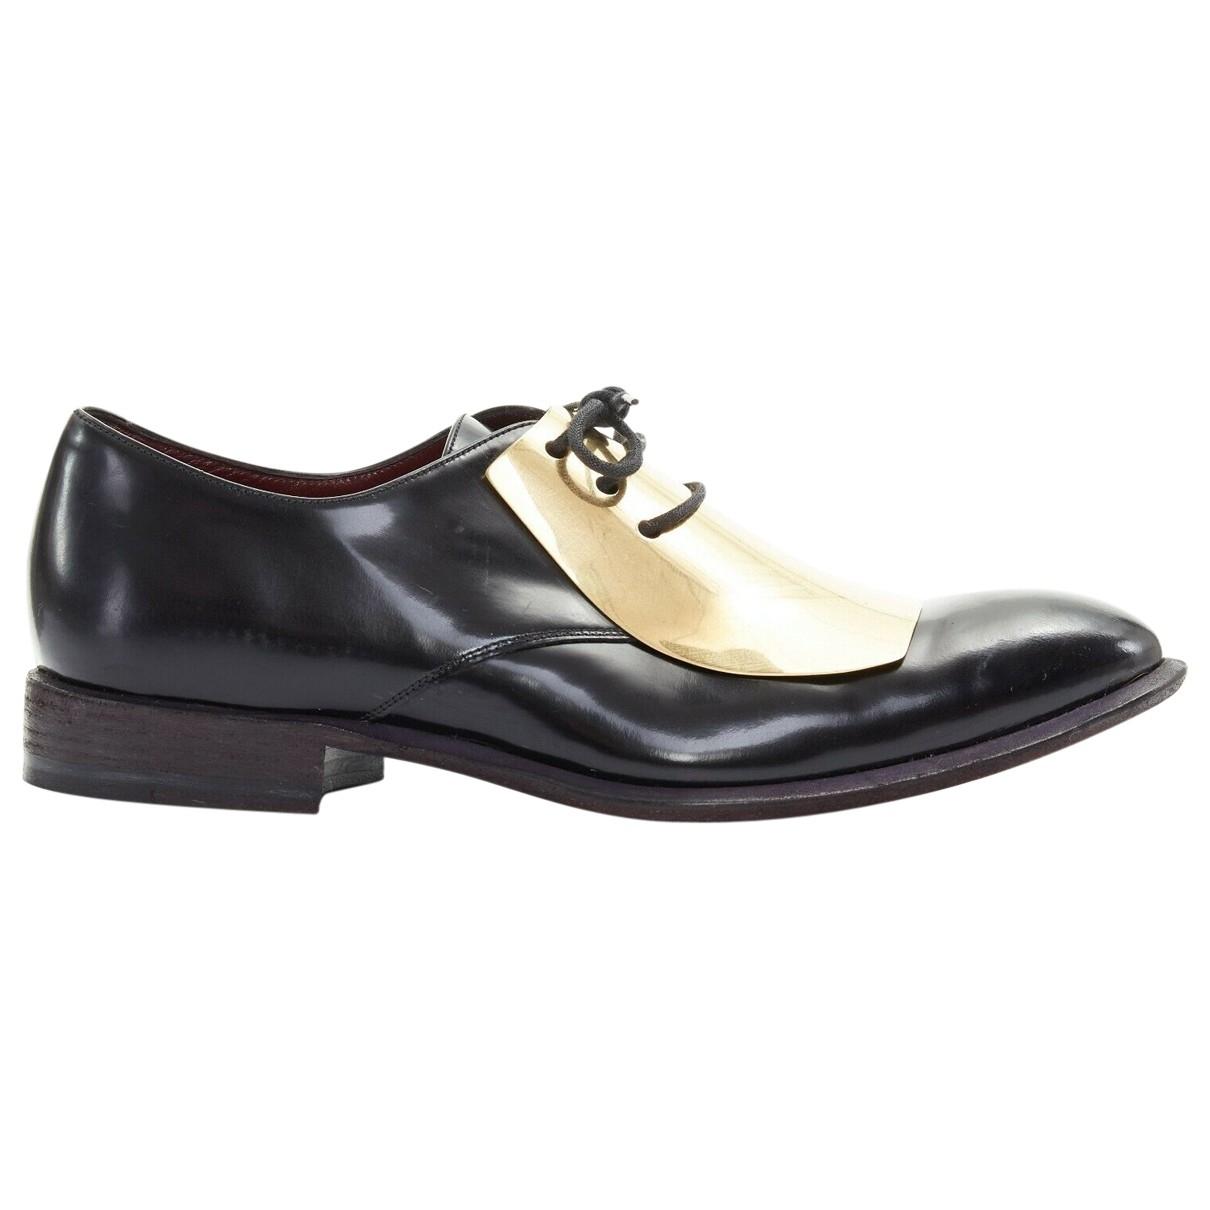 Celine \N Black Leather Lace ups for Women 39.5 EU